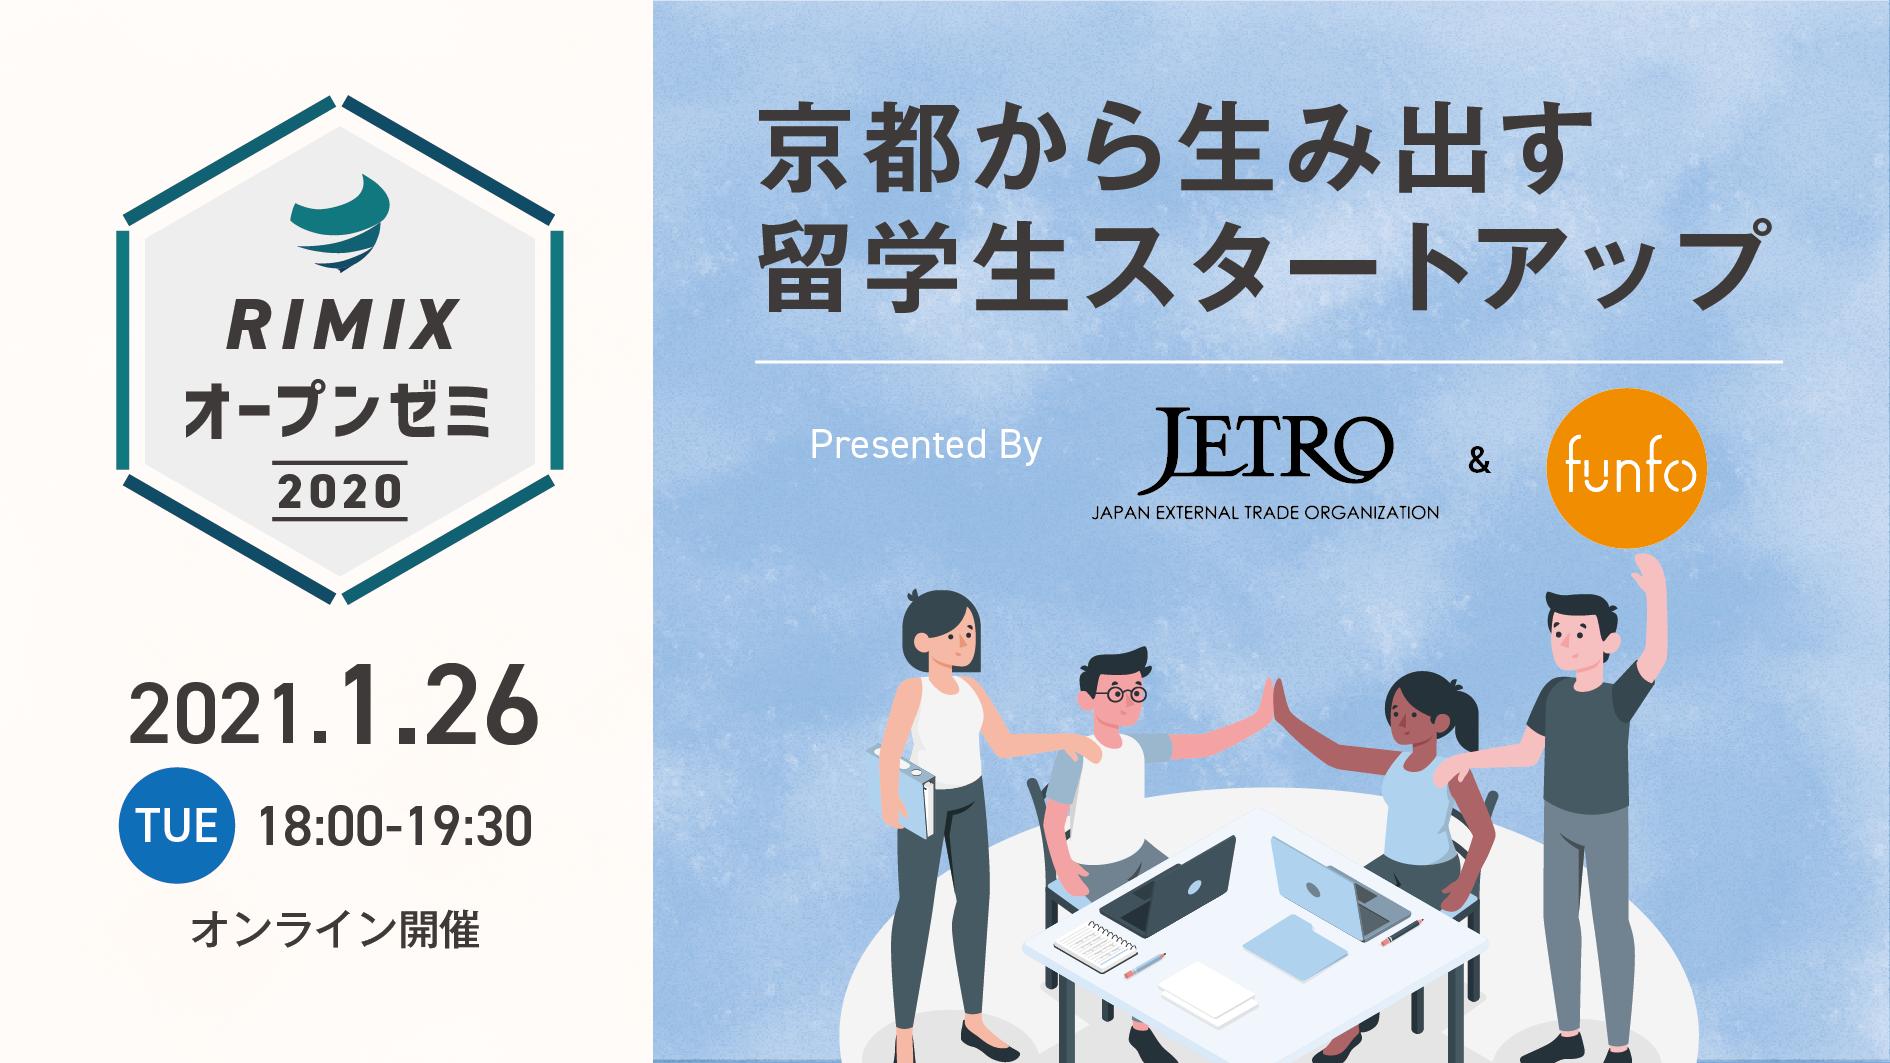 【RIMIXオープンゼミ#3】京都から生み出す留学生スタートアップ Presented by JETRO